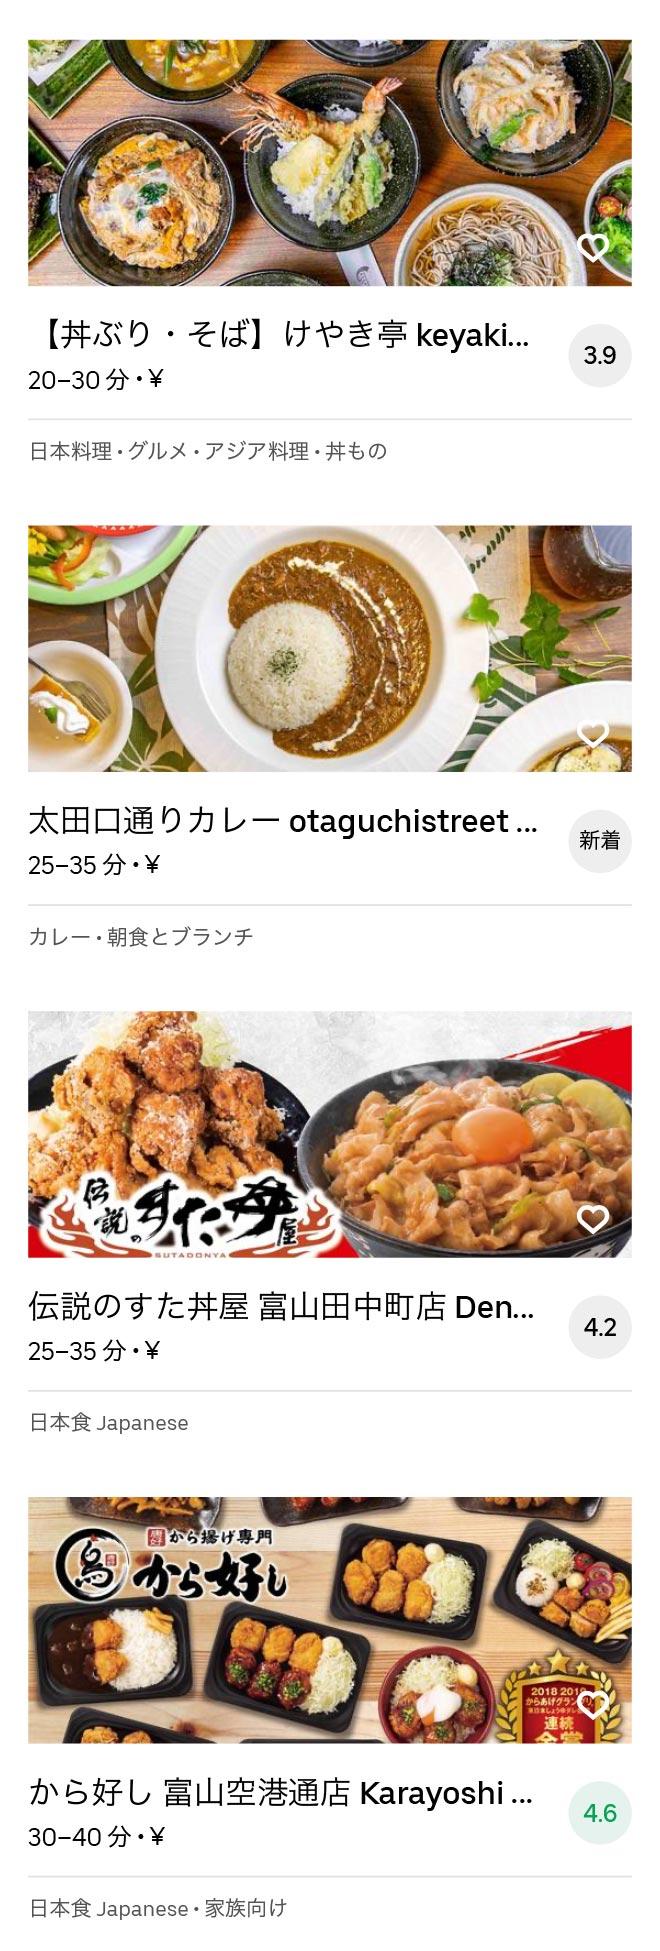 Toyama menu 2009 05